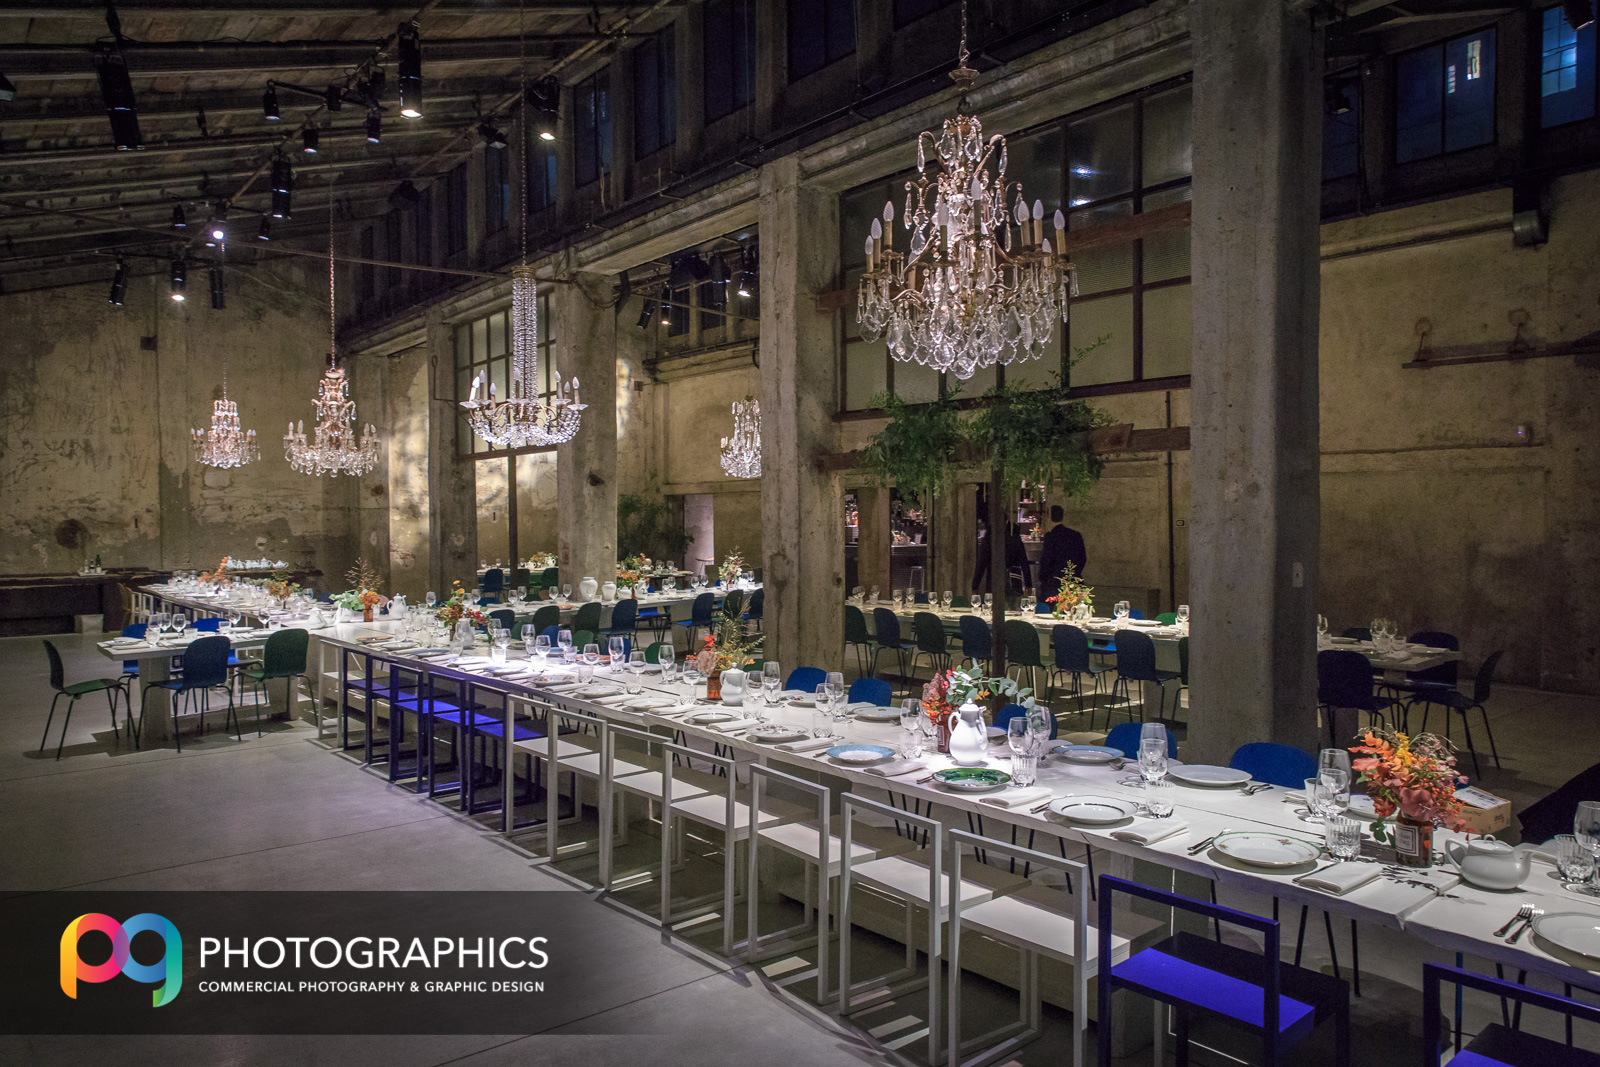 ESCR-2018-conference-event-photography-UK-glasgow-edinburgh-33.jpg